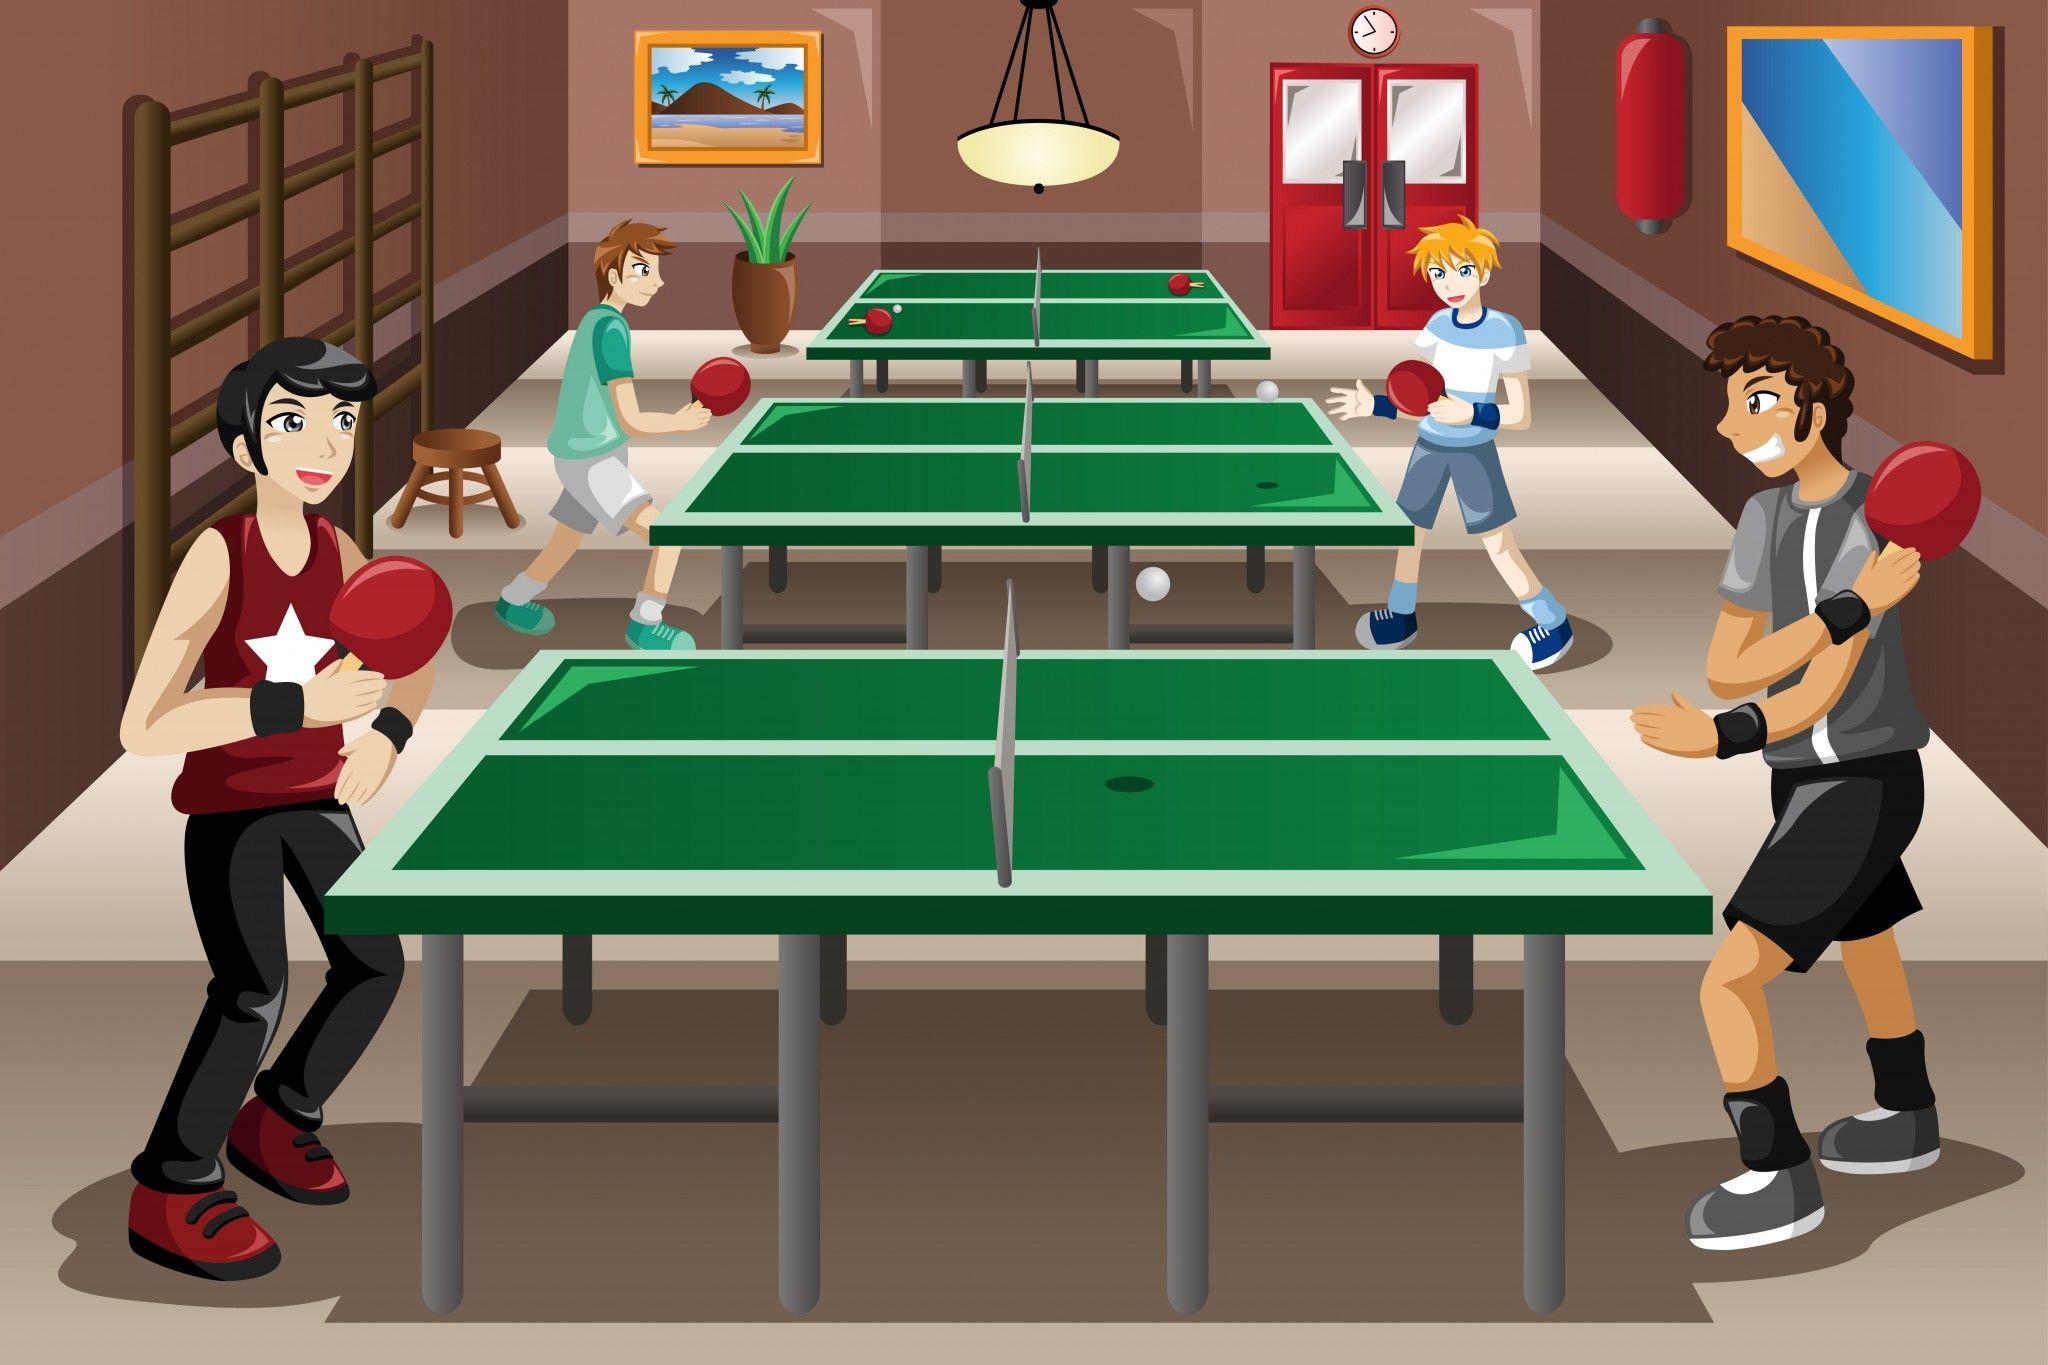 Masa tenisi çizgi karakter table tennis cartoon Tenis, Spor